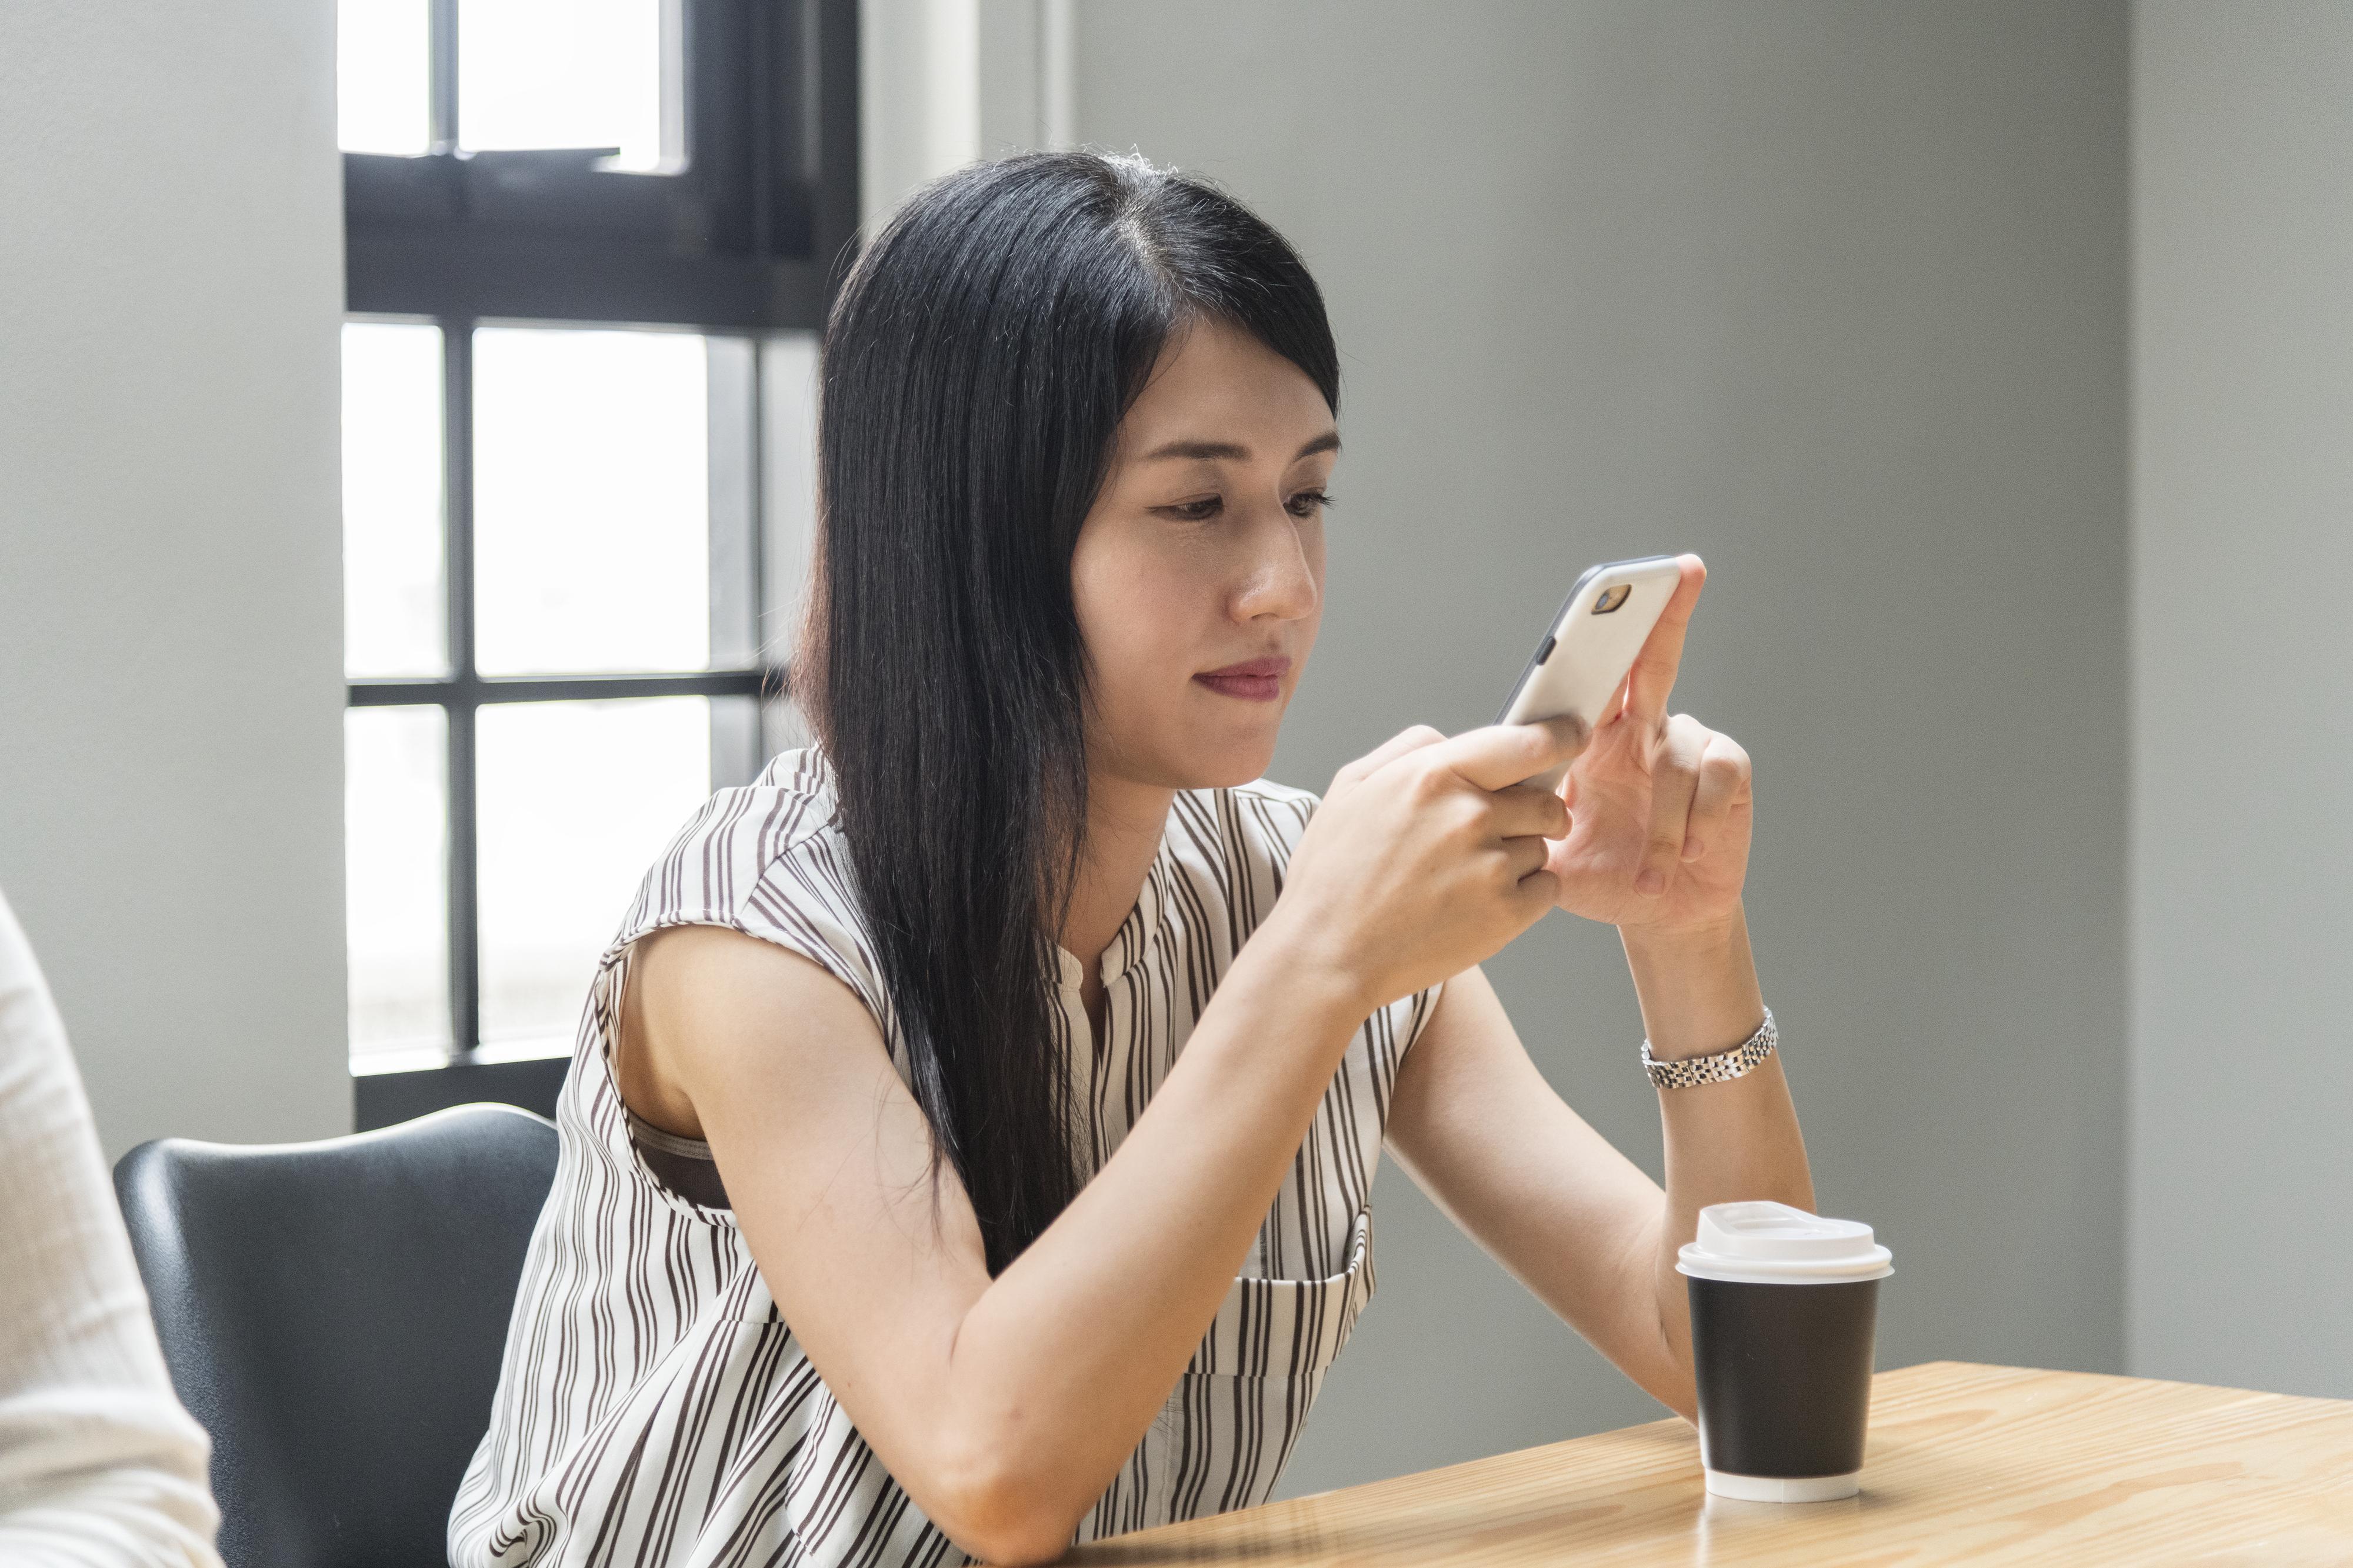 Japan chatting online